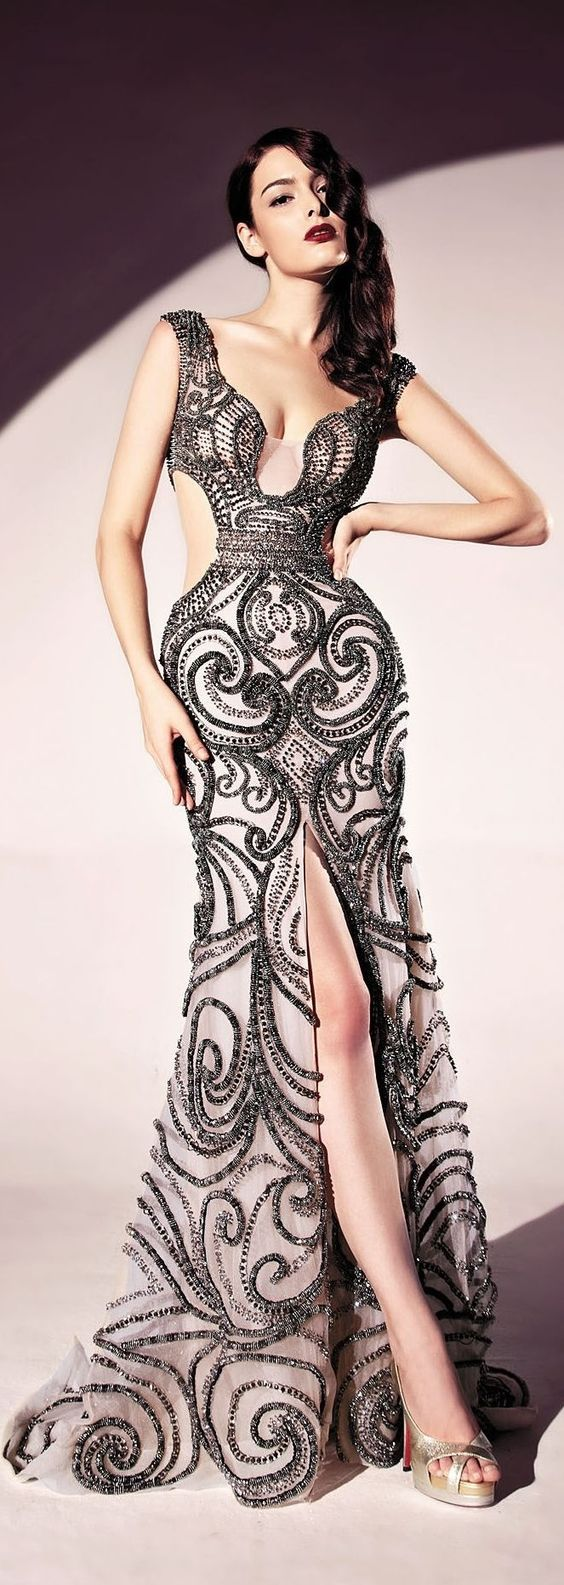 The cute of this dress looks FAB! Look at that waist! Dany Tabet 2014 #danytabet #stylish #dress #stylishdress #fashion #moda